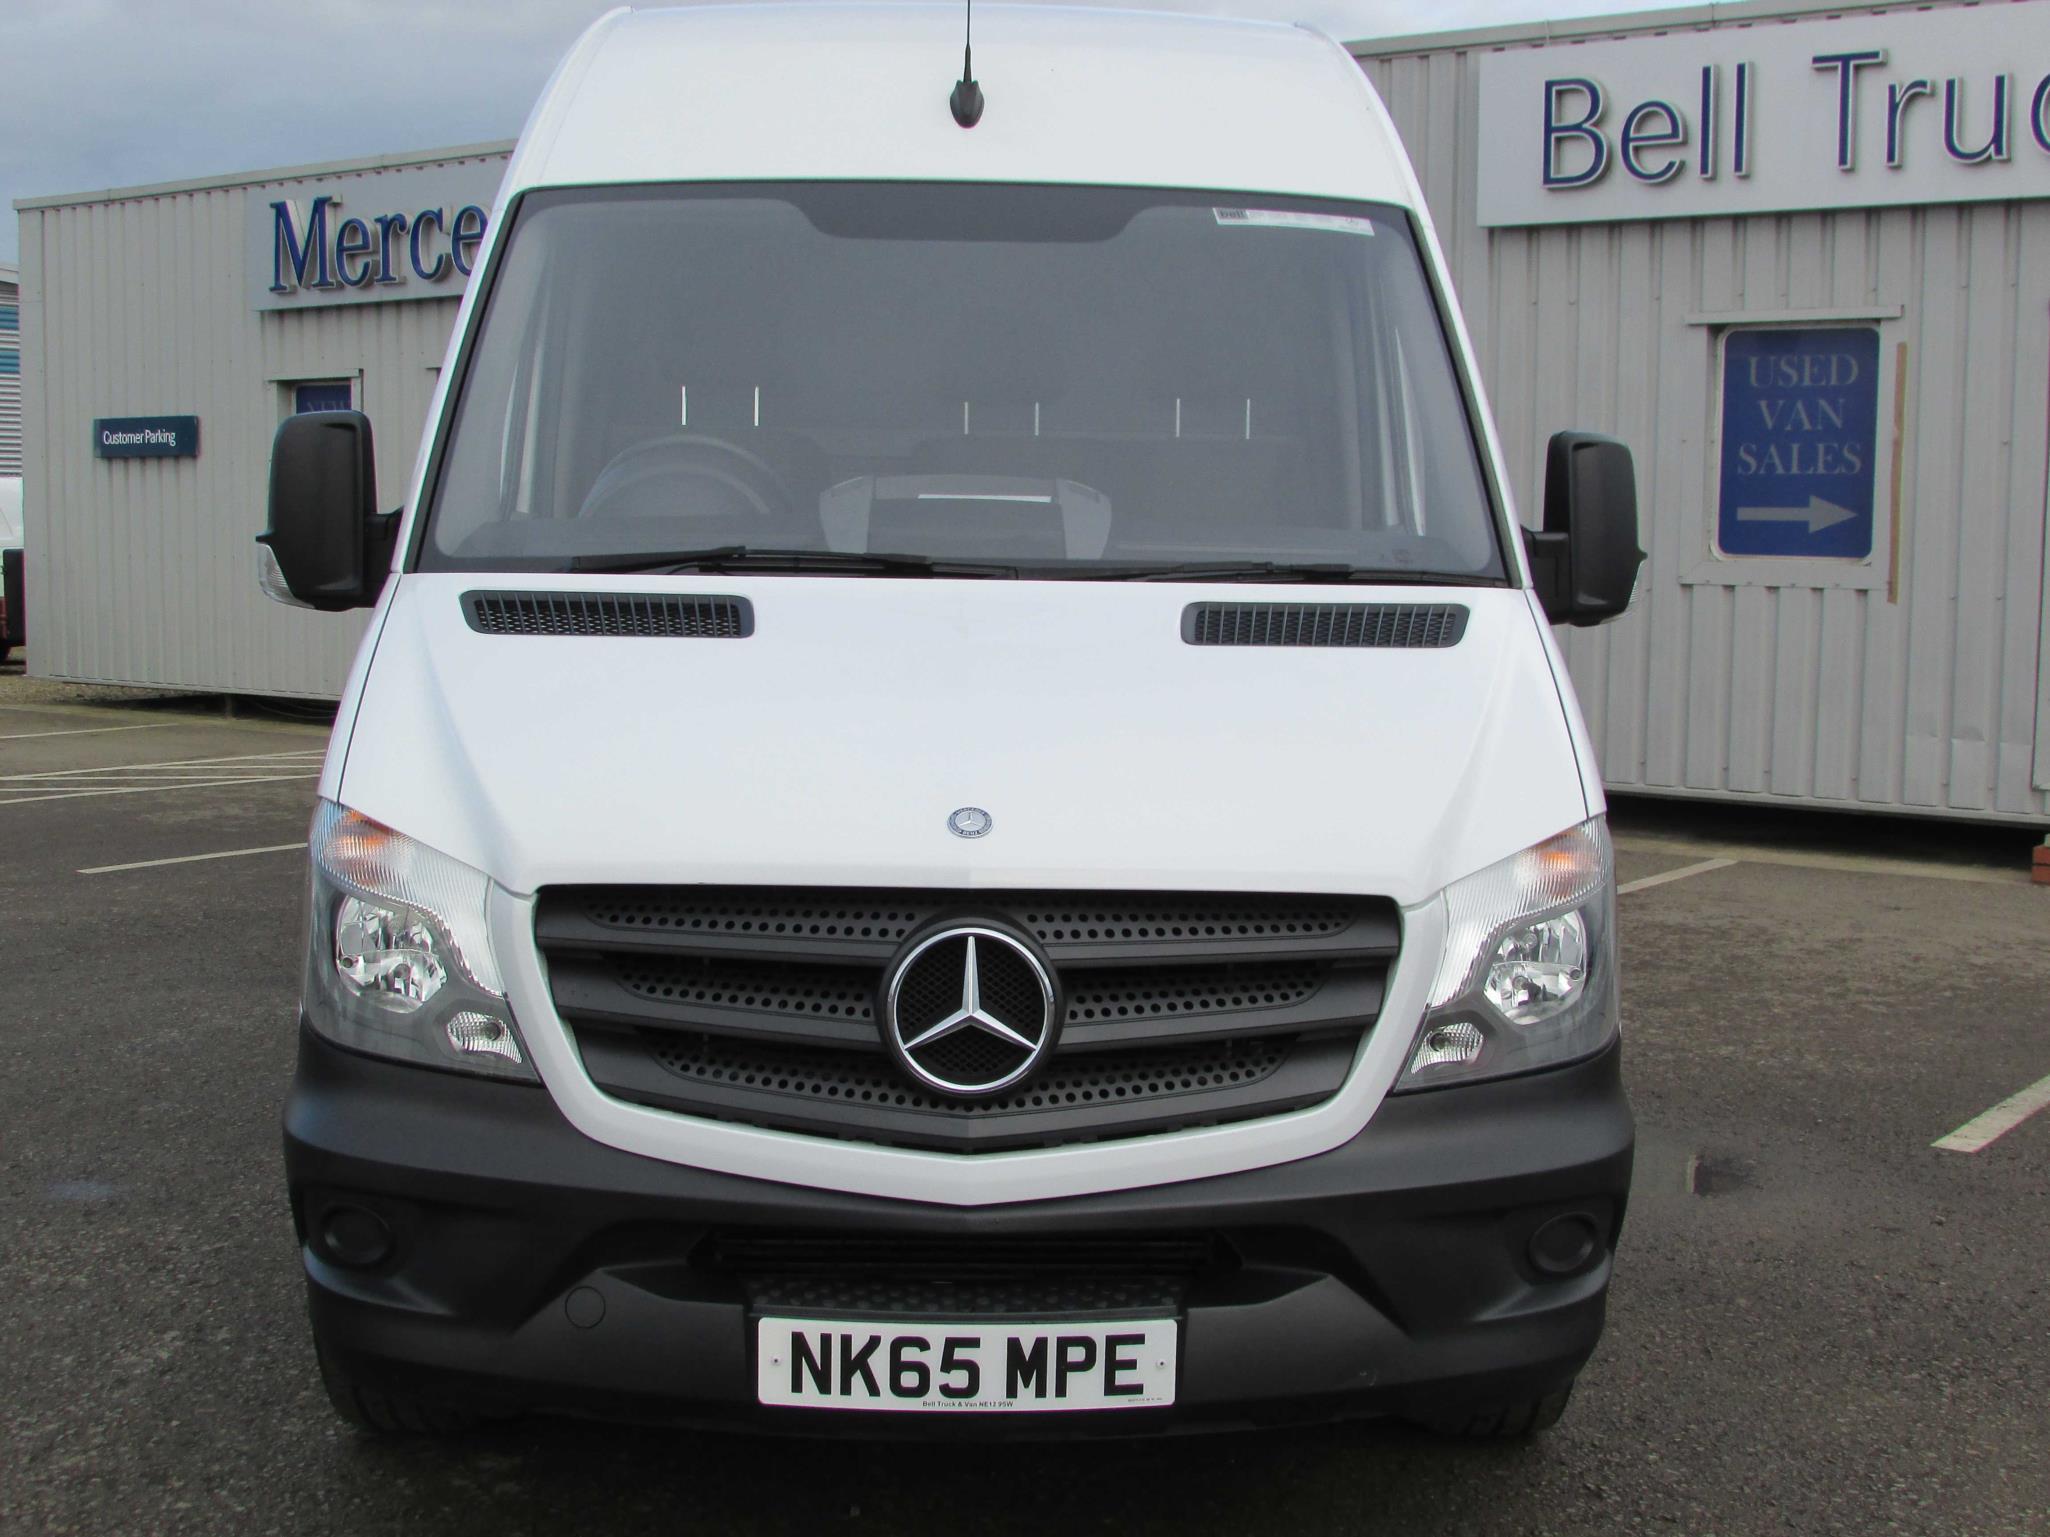 Mercedes benz sprinter 313cdi van bell truck and van for Mercedes benz sprinter van accessories